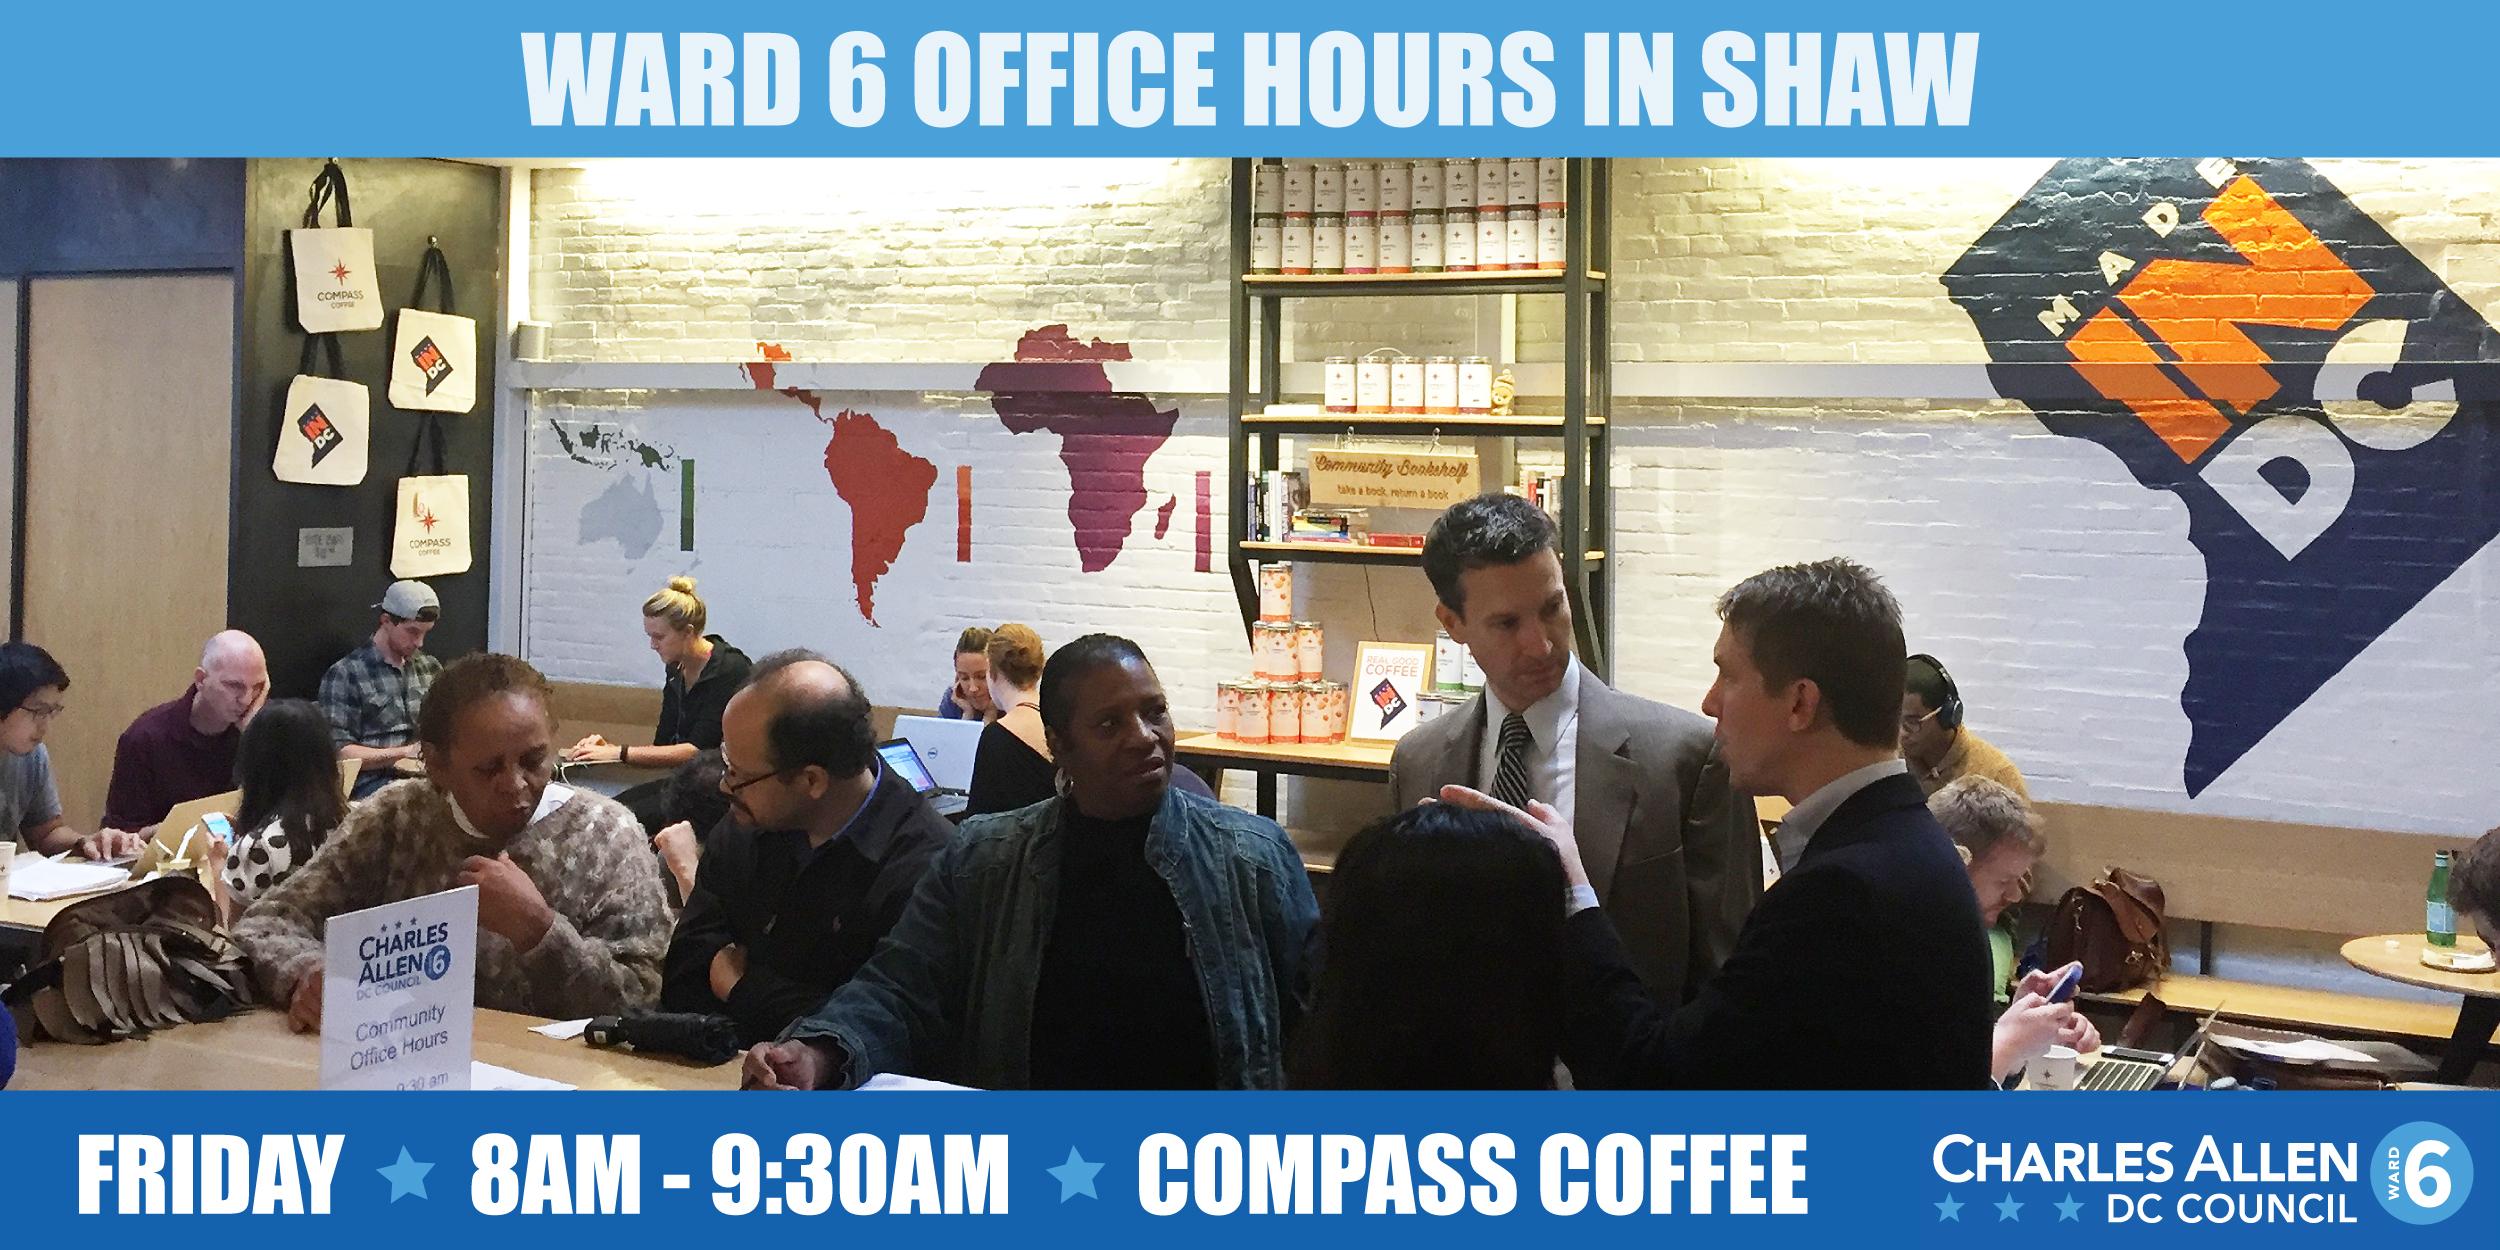 Shaw-Office-Hours.jpg